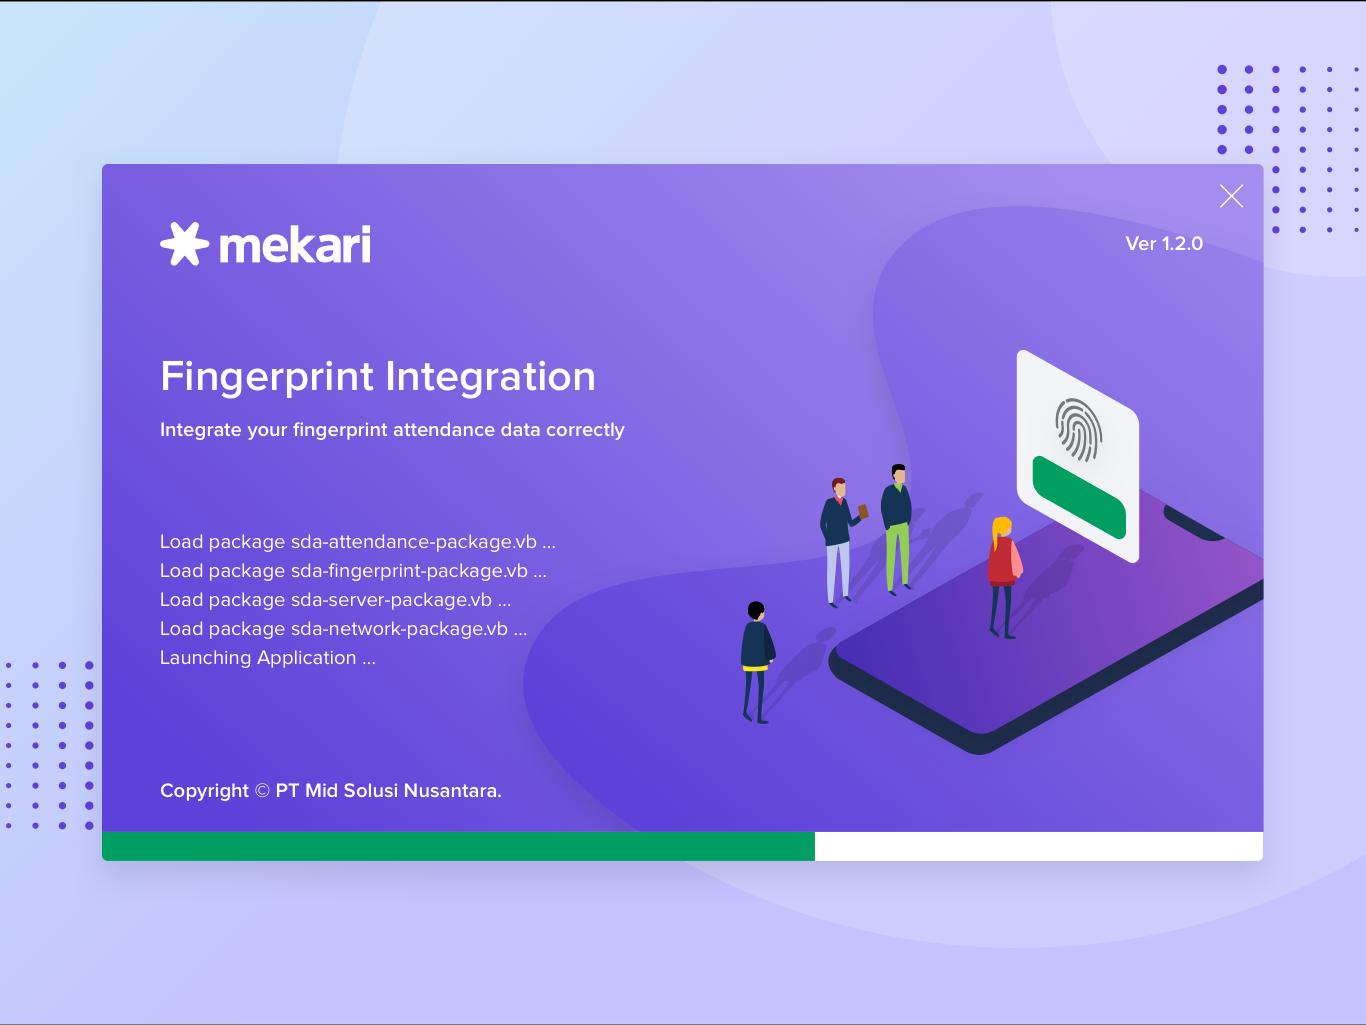 Mekari fingerprint